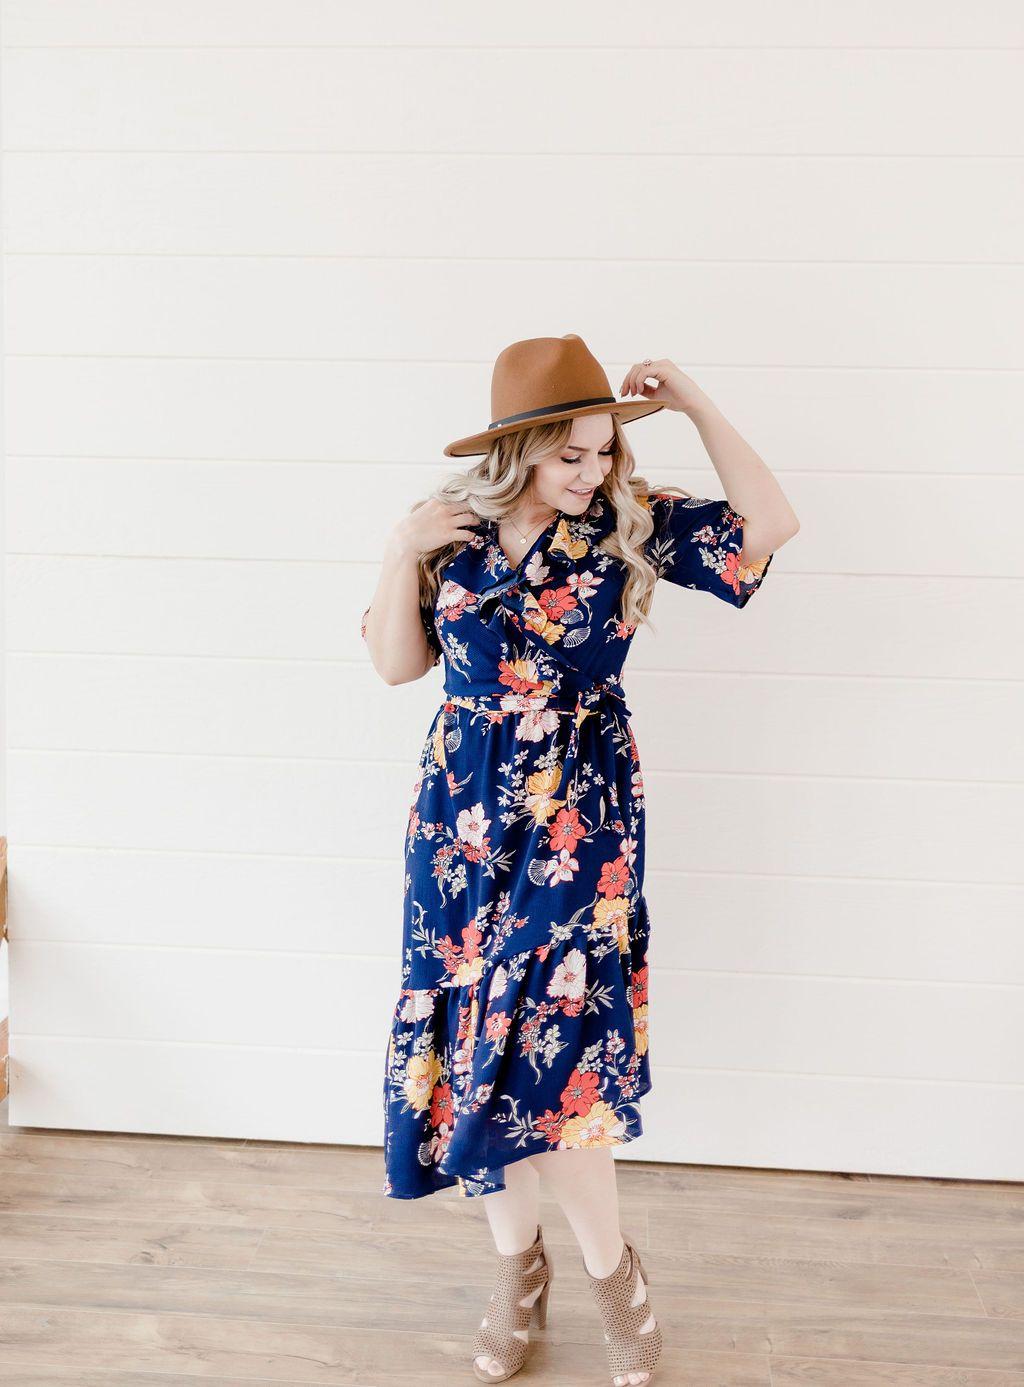 #juniperdressco #handmadeskirt #skirt #customskirt #juniperclothing #modestclothing #slowfashion #ootd #modestootd #utahstyle #utahfashion #modestblogger #utahfashiondesigner #madeintheUSA #skirtoutfit #springskirt #summerskirt #skirtstyle #midiskirt #utahboutique #ruffleskirt #ruffles